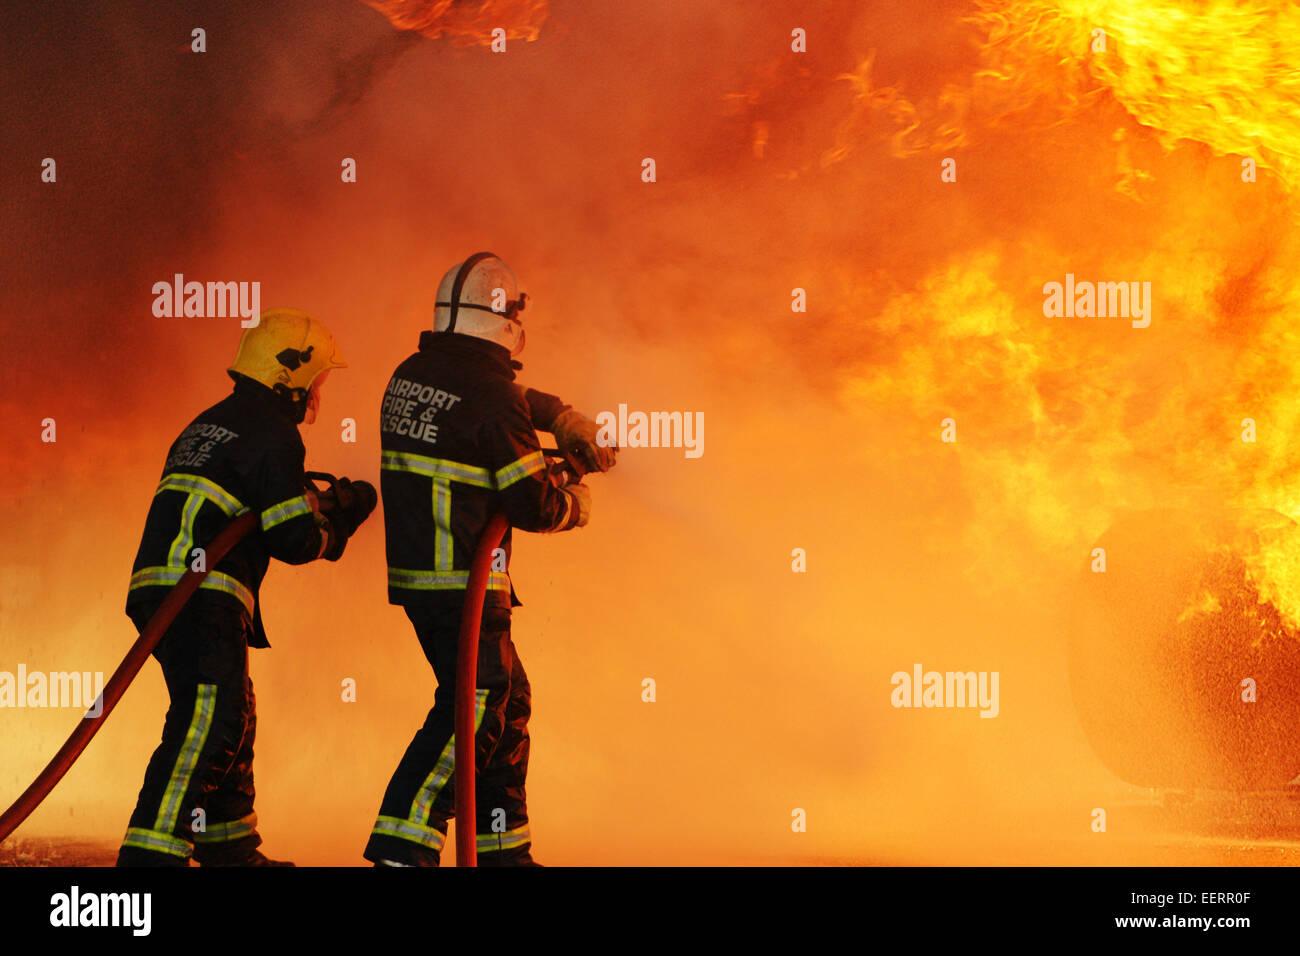 Aircraft crash Disaster, inferno - Stock Image